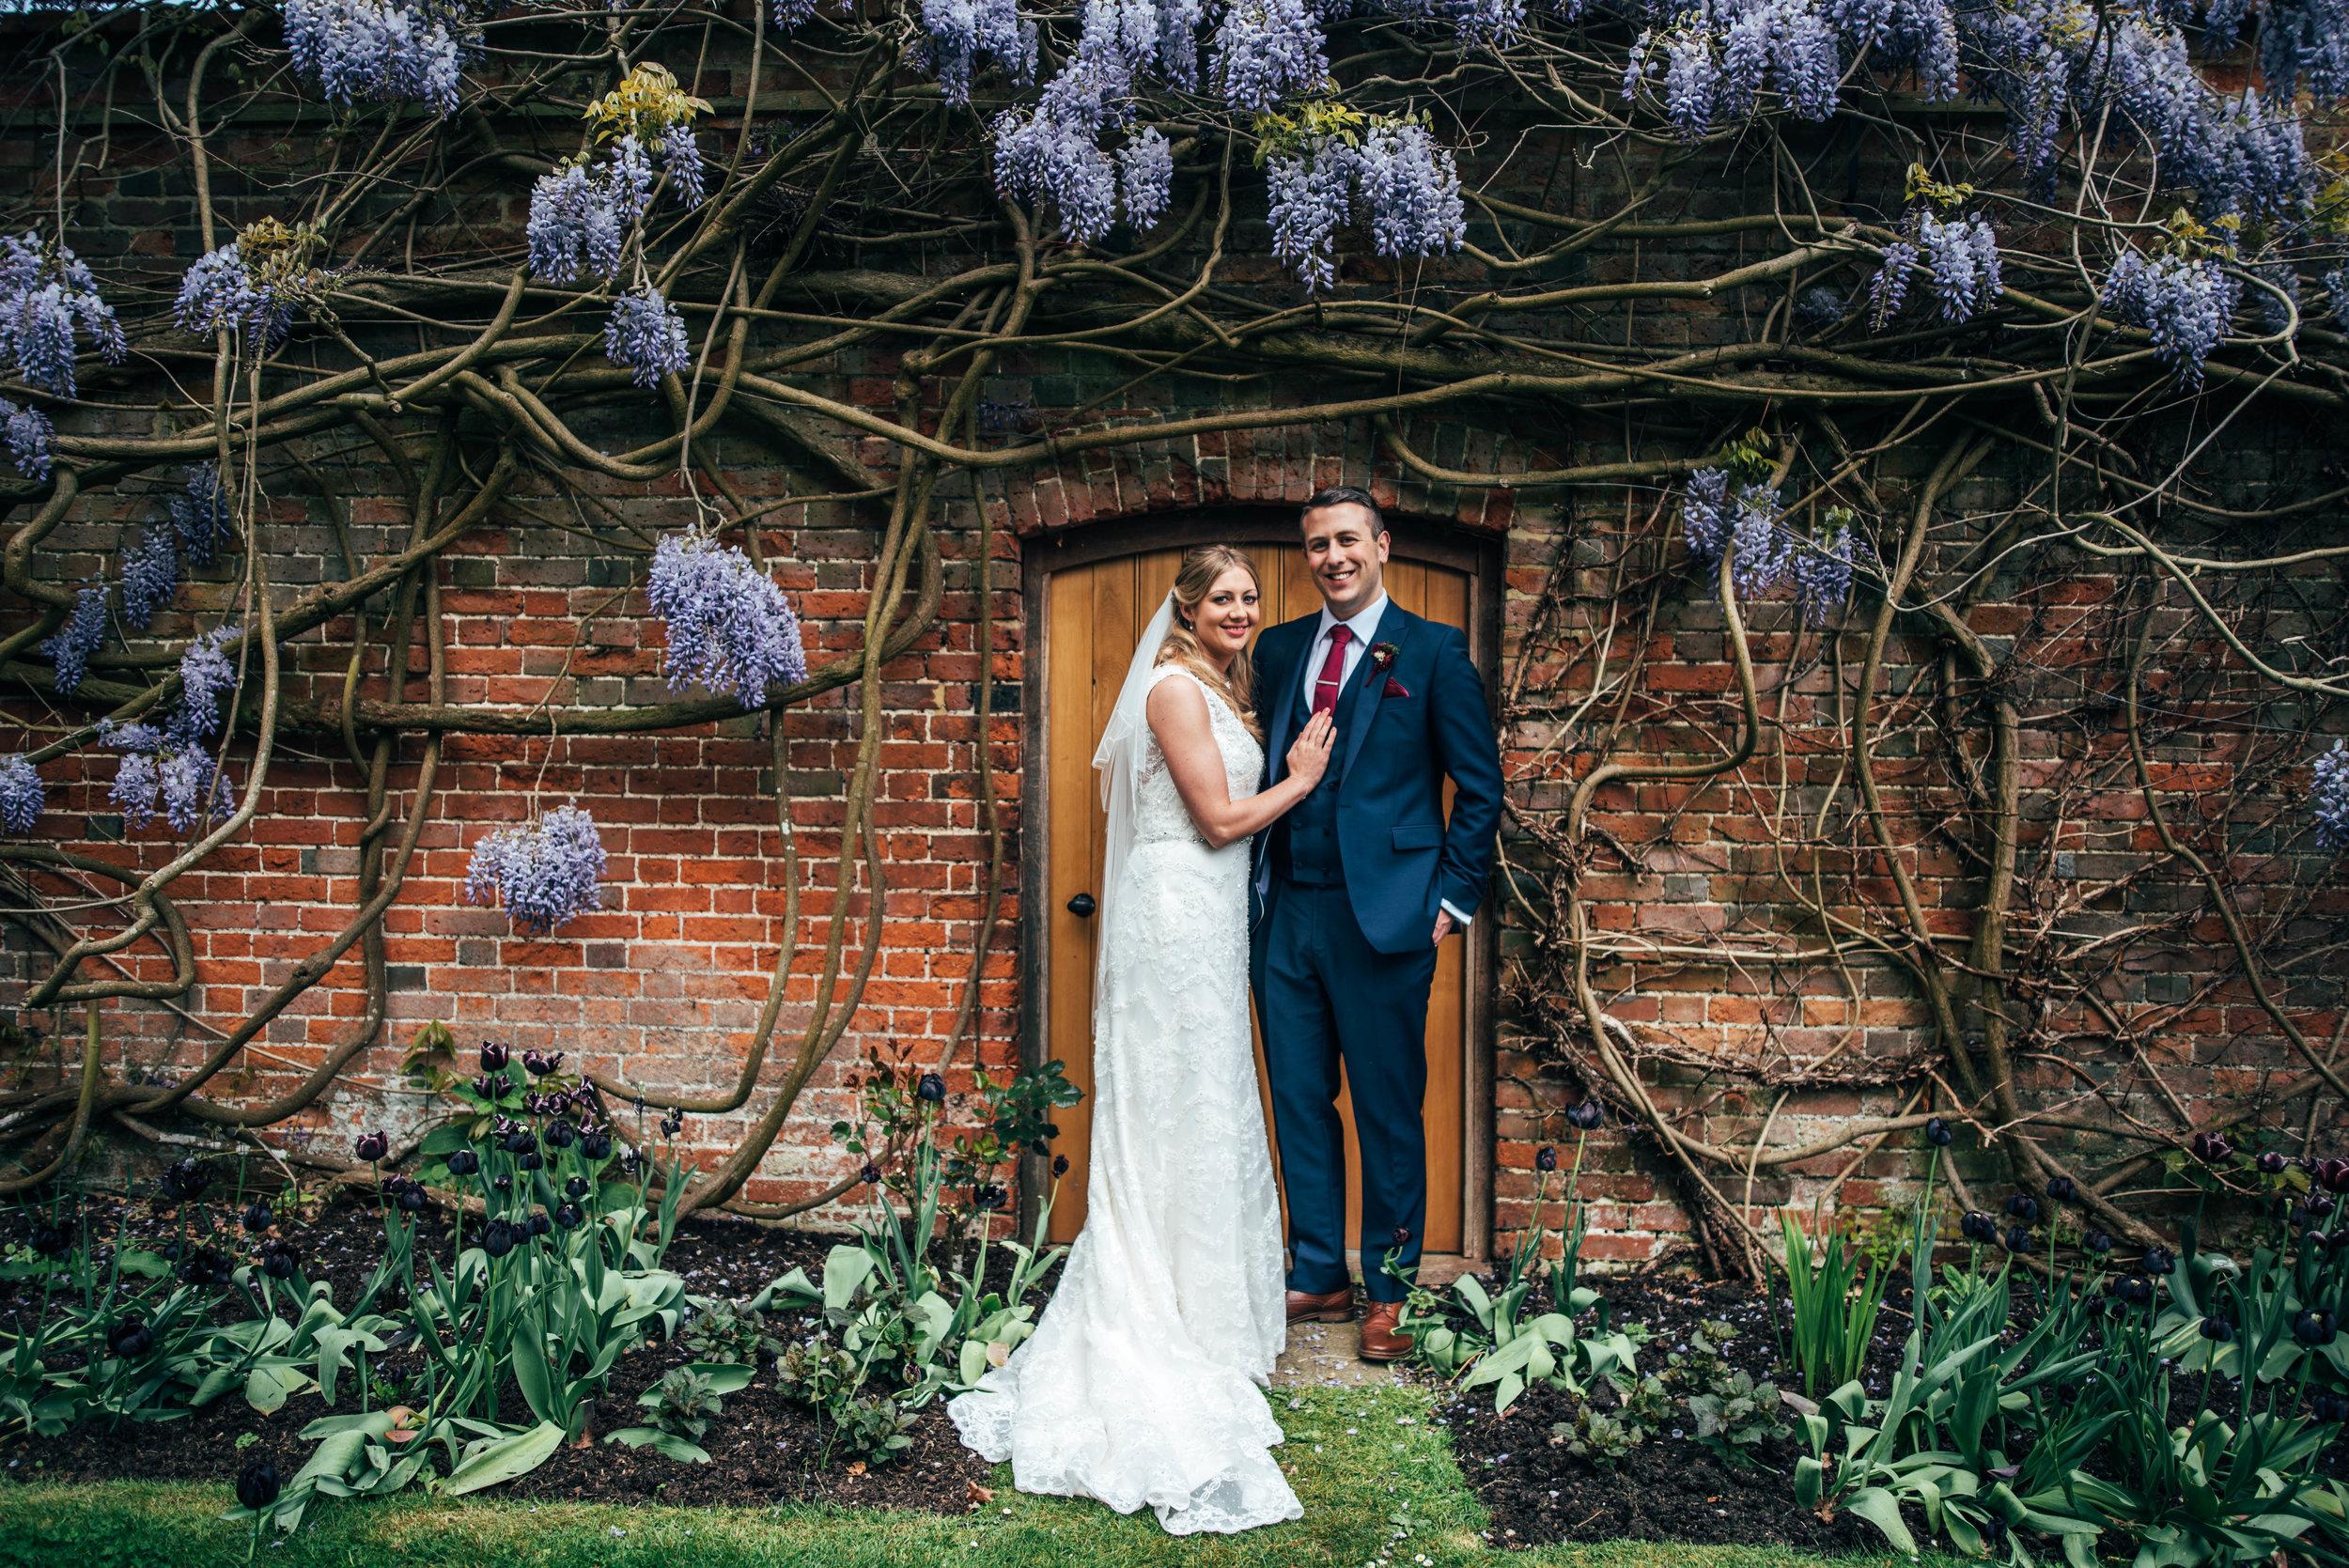 Bride and Groom Magnolia Blake Hall Essex Documentary Wedding Photographer